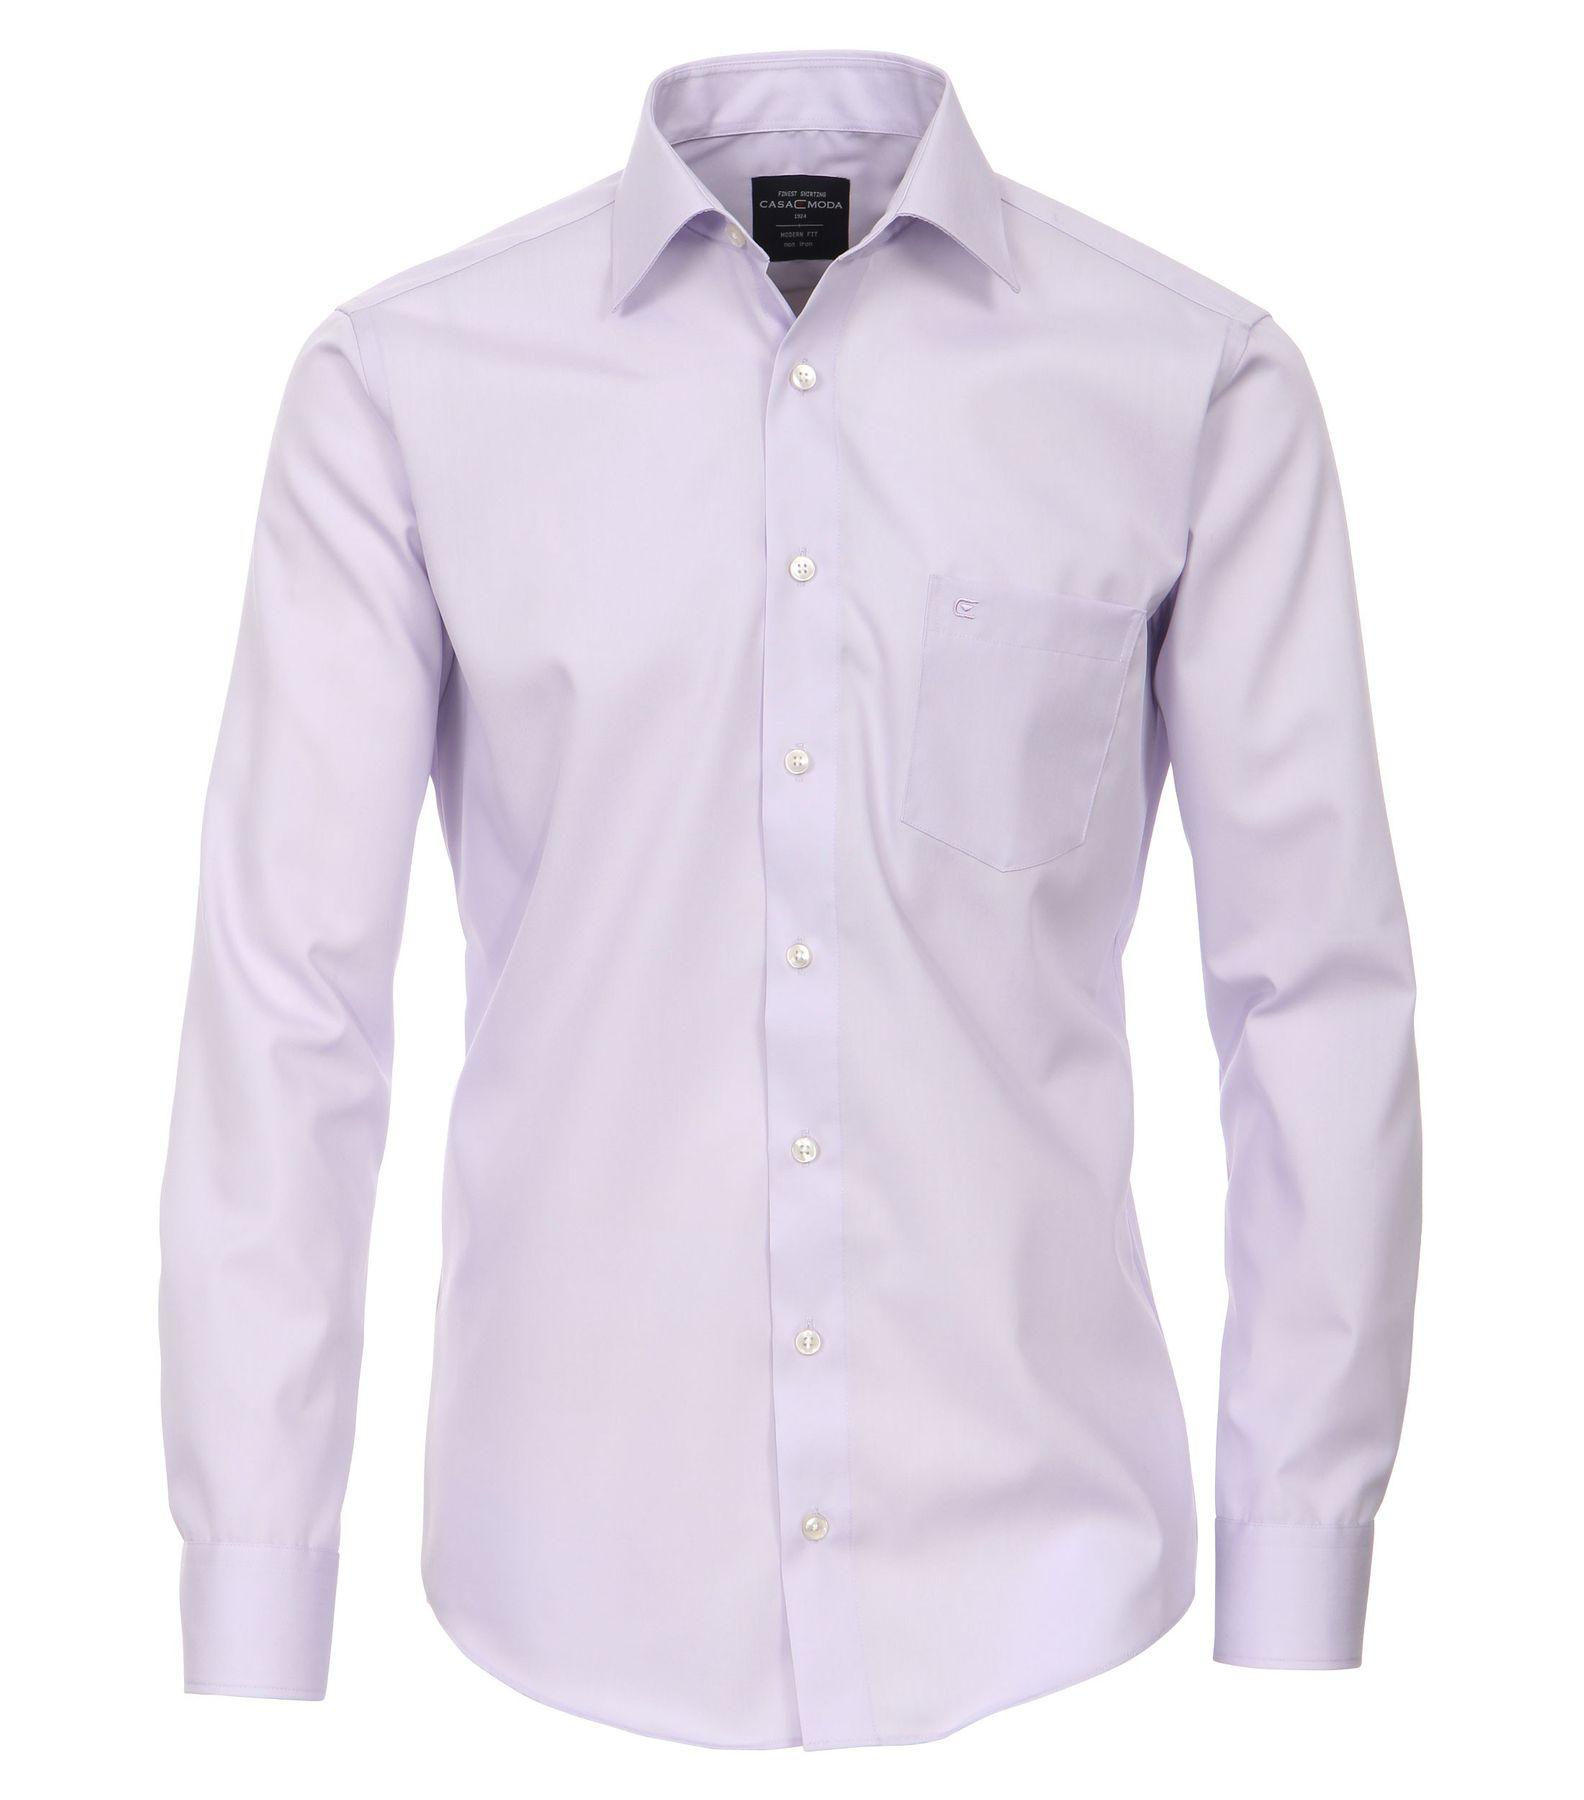 Casa Moda - Modern Fit - Bügelfreies Herren Business langarm Hemd in verschiedene Farben (006550) – Bild 1